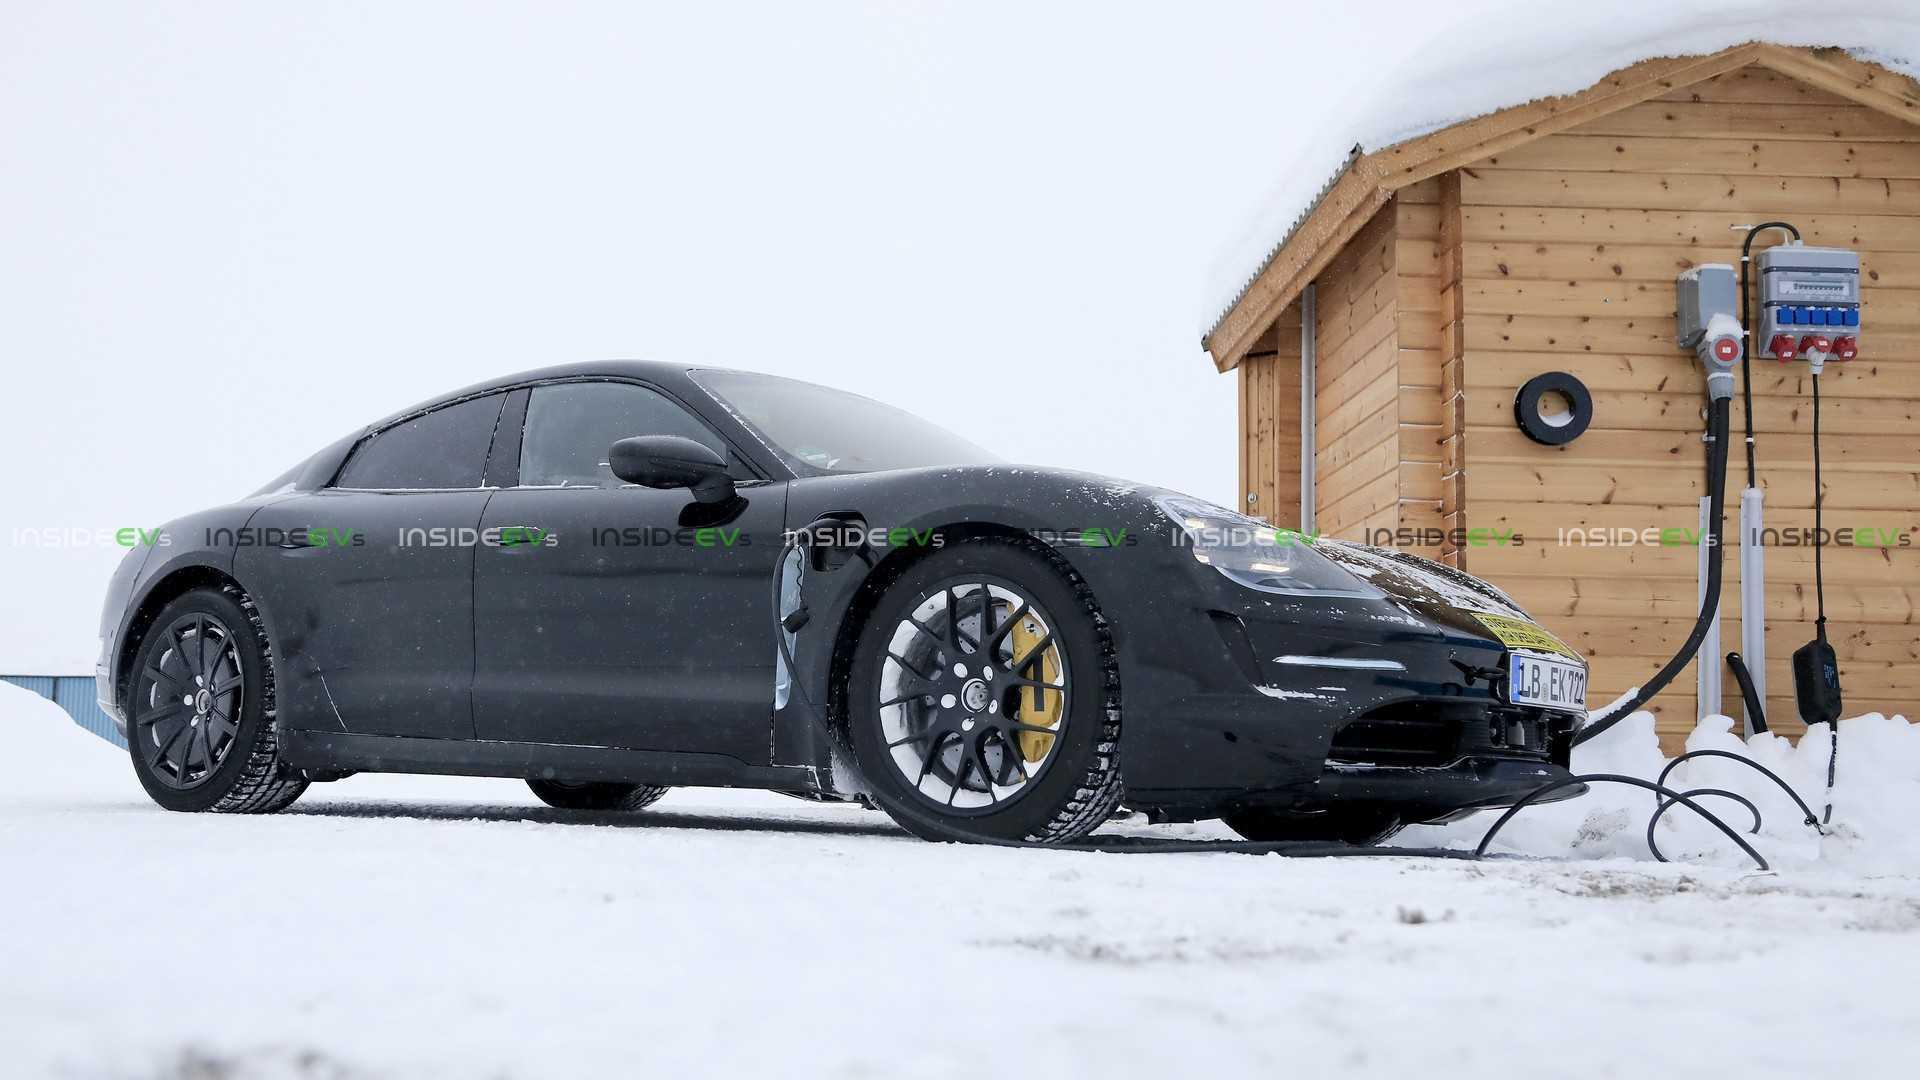 Porsche Taycan Specs Modeled: 2 8-Second 0-60, 280-Mile Range